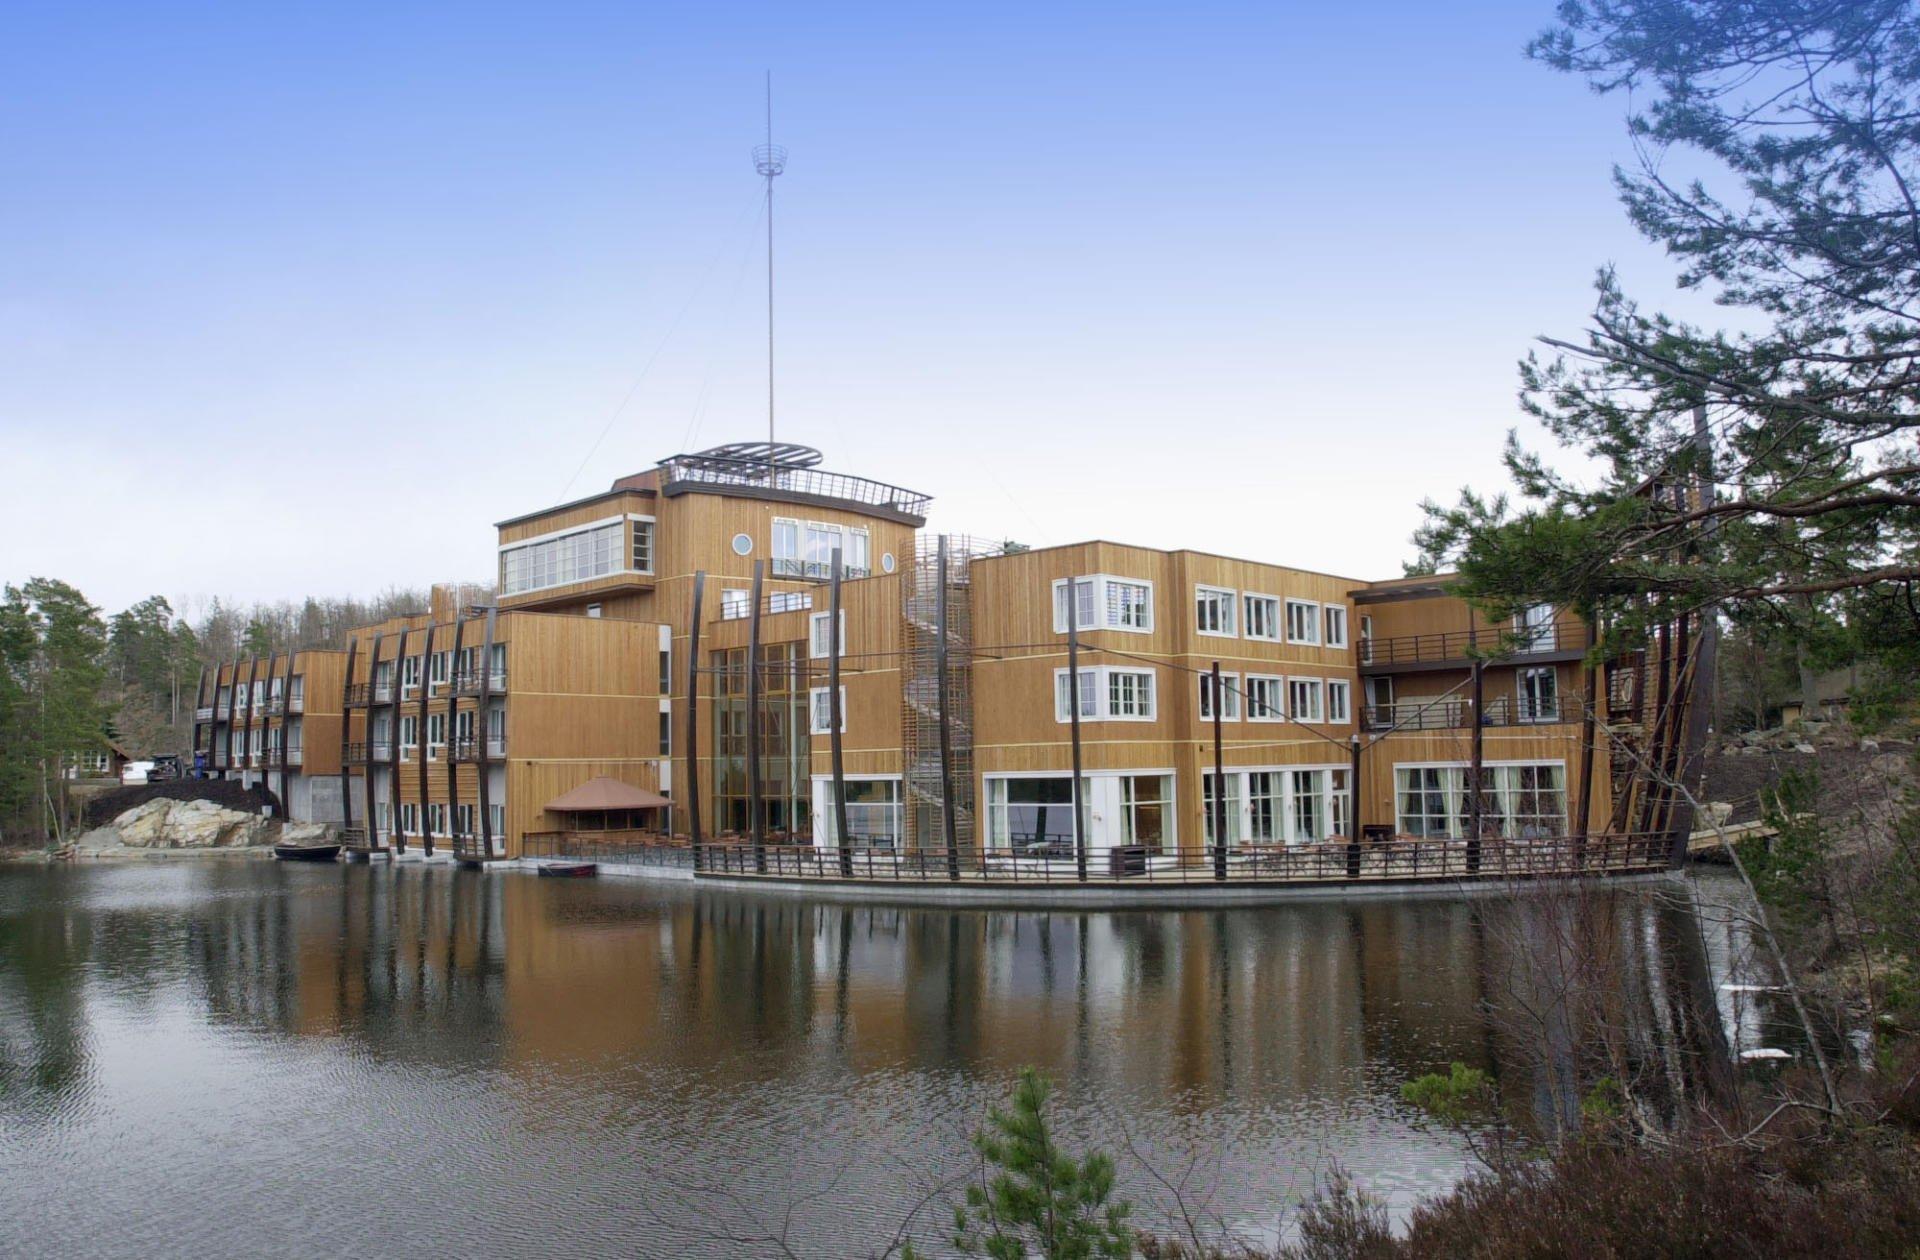 Drømmeferie på Dyreparken Hotell med Kaptein Sabeltann-forestilling